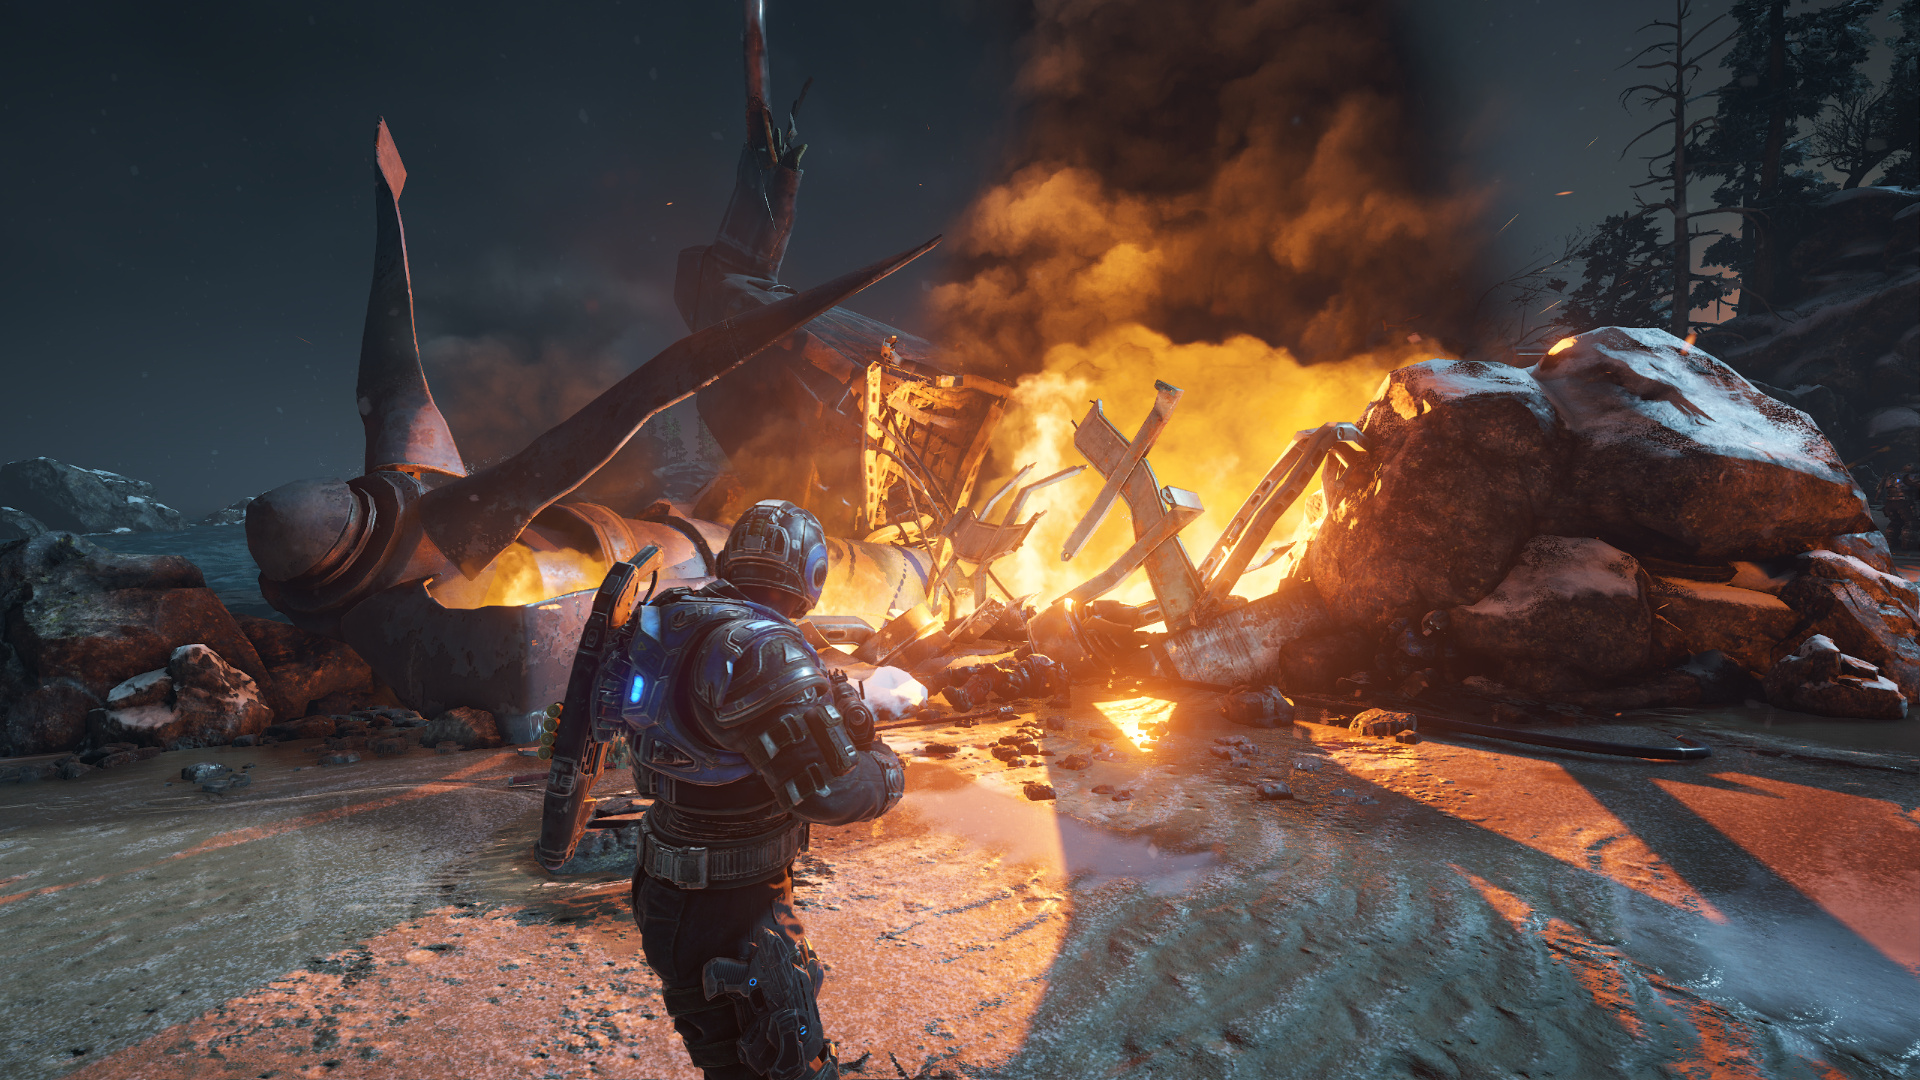 Gears of War 4 im Technik-Test: Wahnsinnig, diese PC-Version - Achtung: Ab hier folgen zwei Handvoll Bilder aus den ersten drei Stunden (Screenshot: Golem.de)